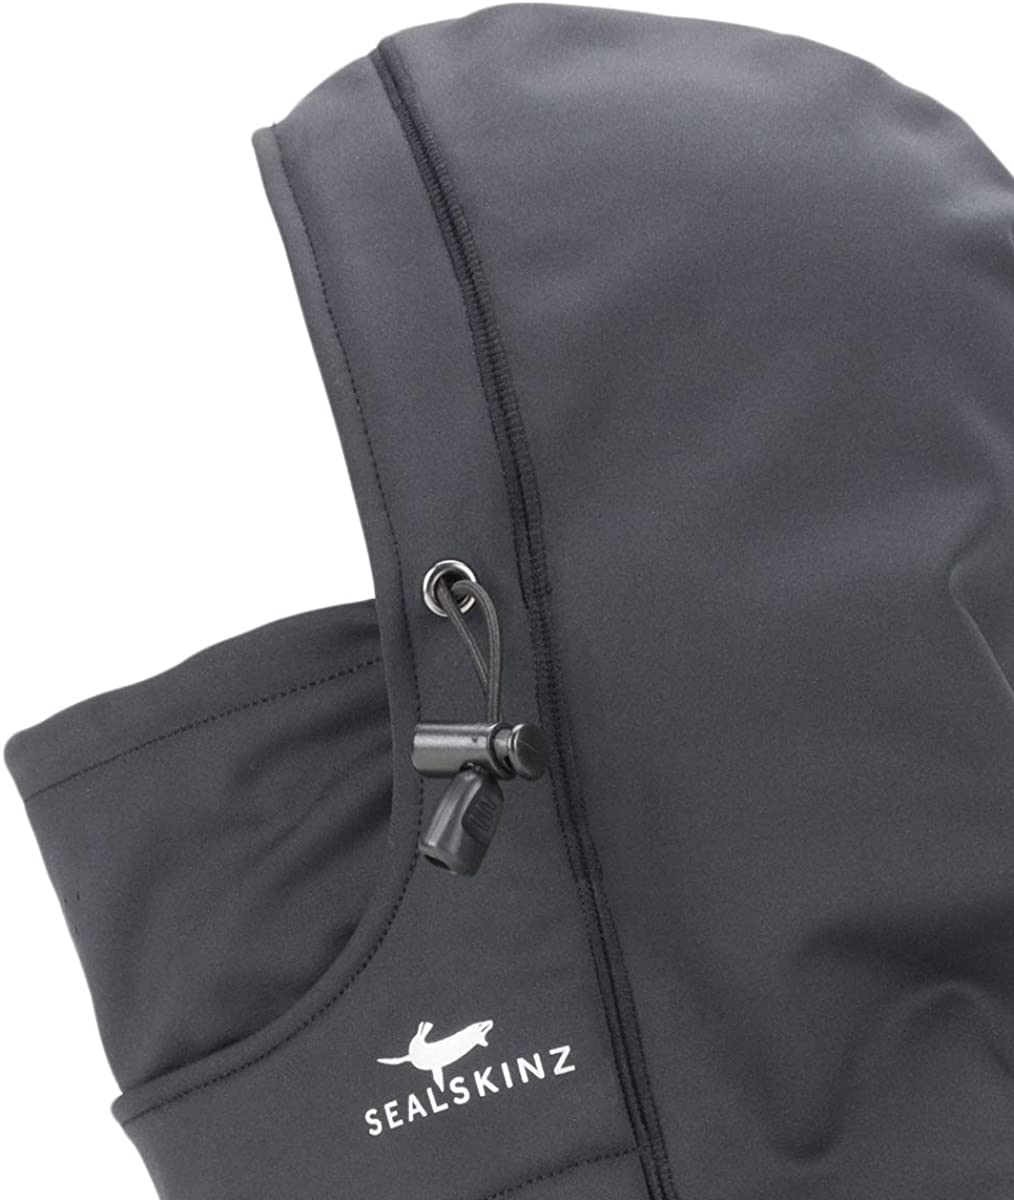 SealSkinz Unisex Sealskinz Waterproof All Weather Gaitor Grey Sports Outdoors